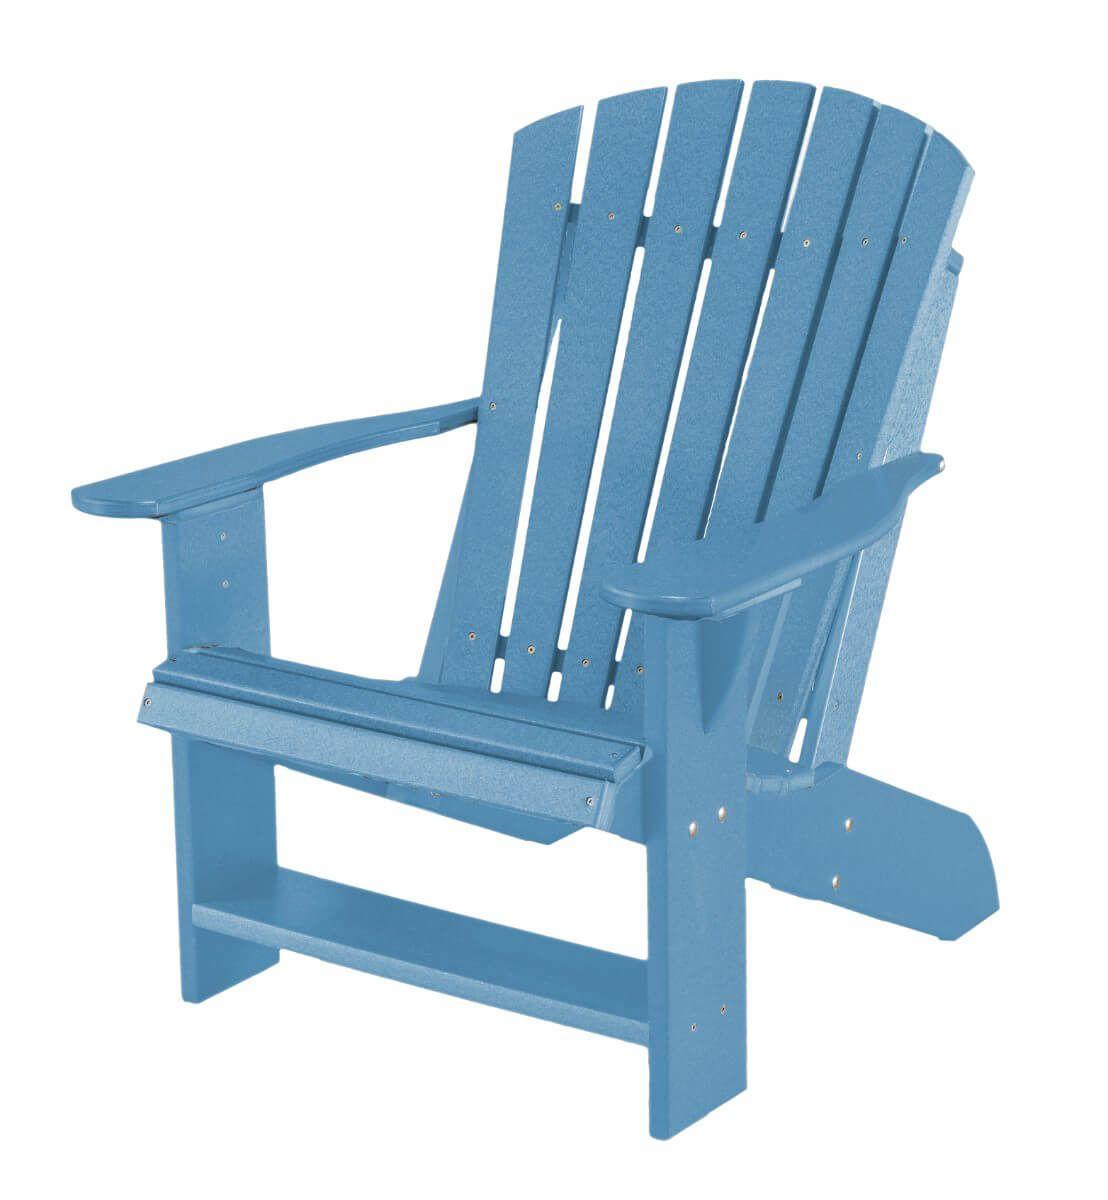 Powder Blue Sidra Adirondack Chair